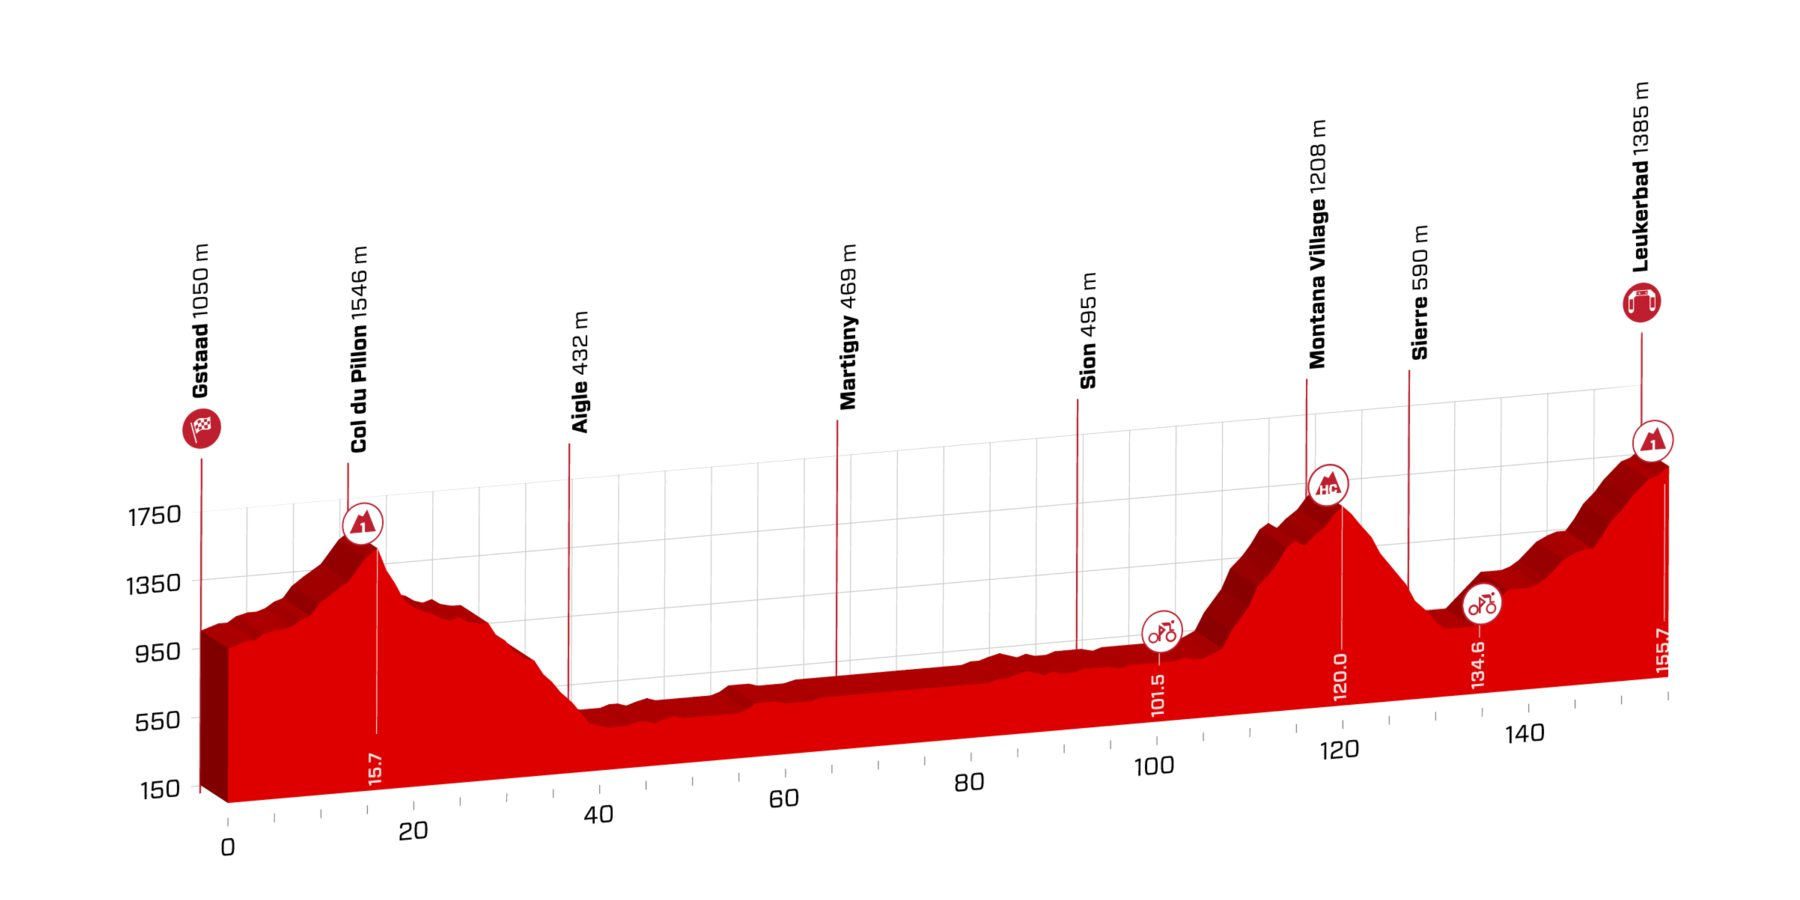 Gstaad – Leukerbad. 155 kms.